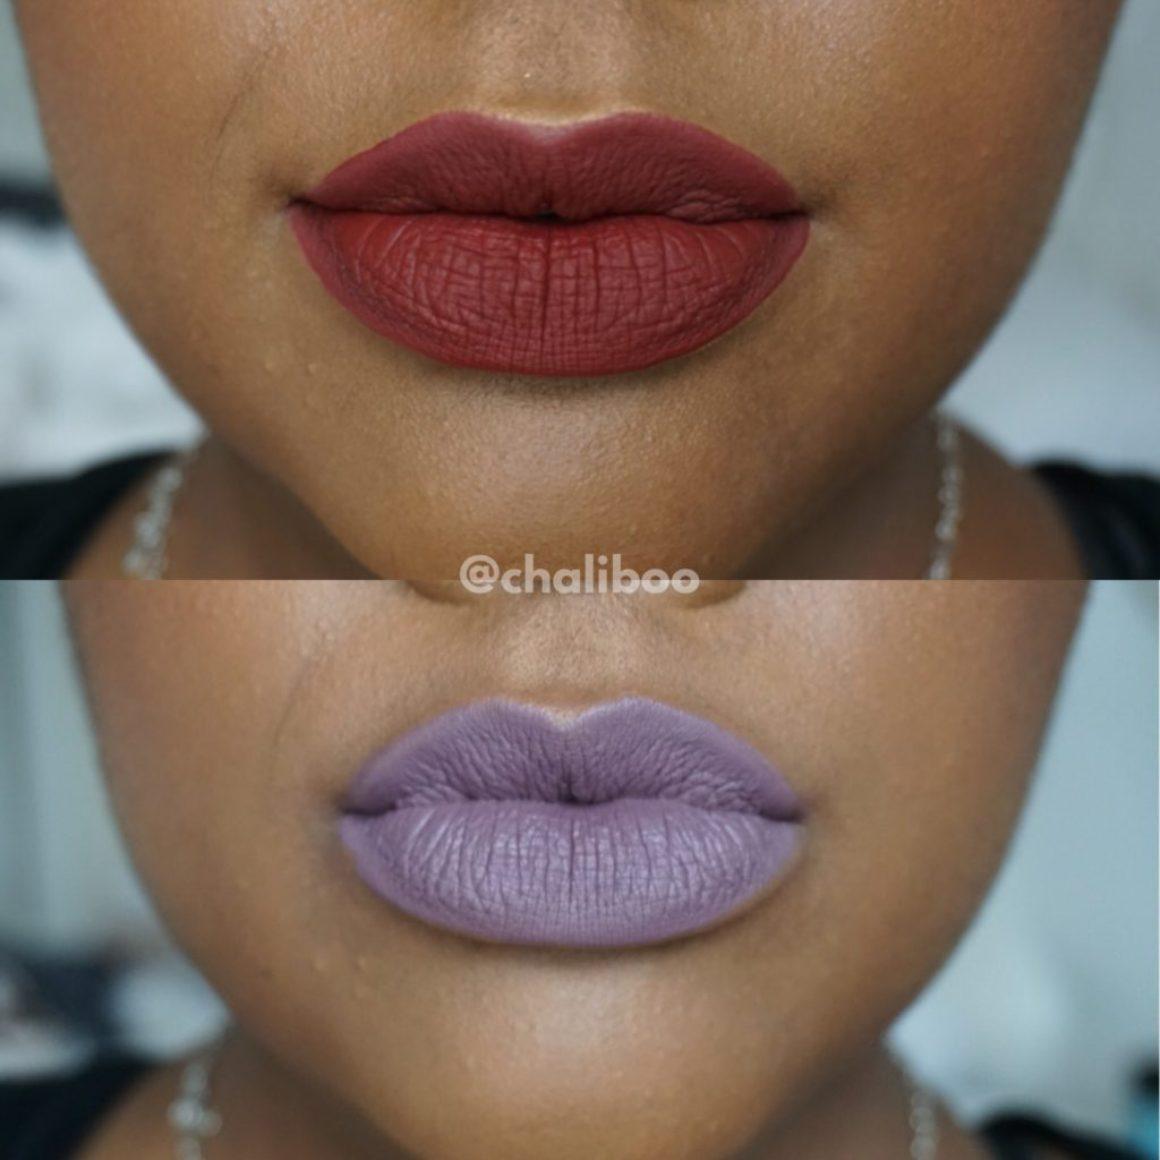 Swatched: Jeffree Star Velour Liquid Lipsticks in Scorpio & Unicorn Blood